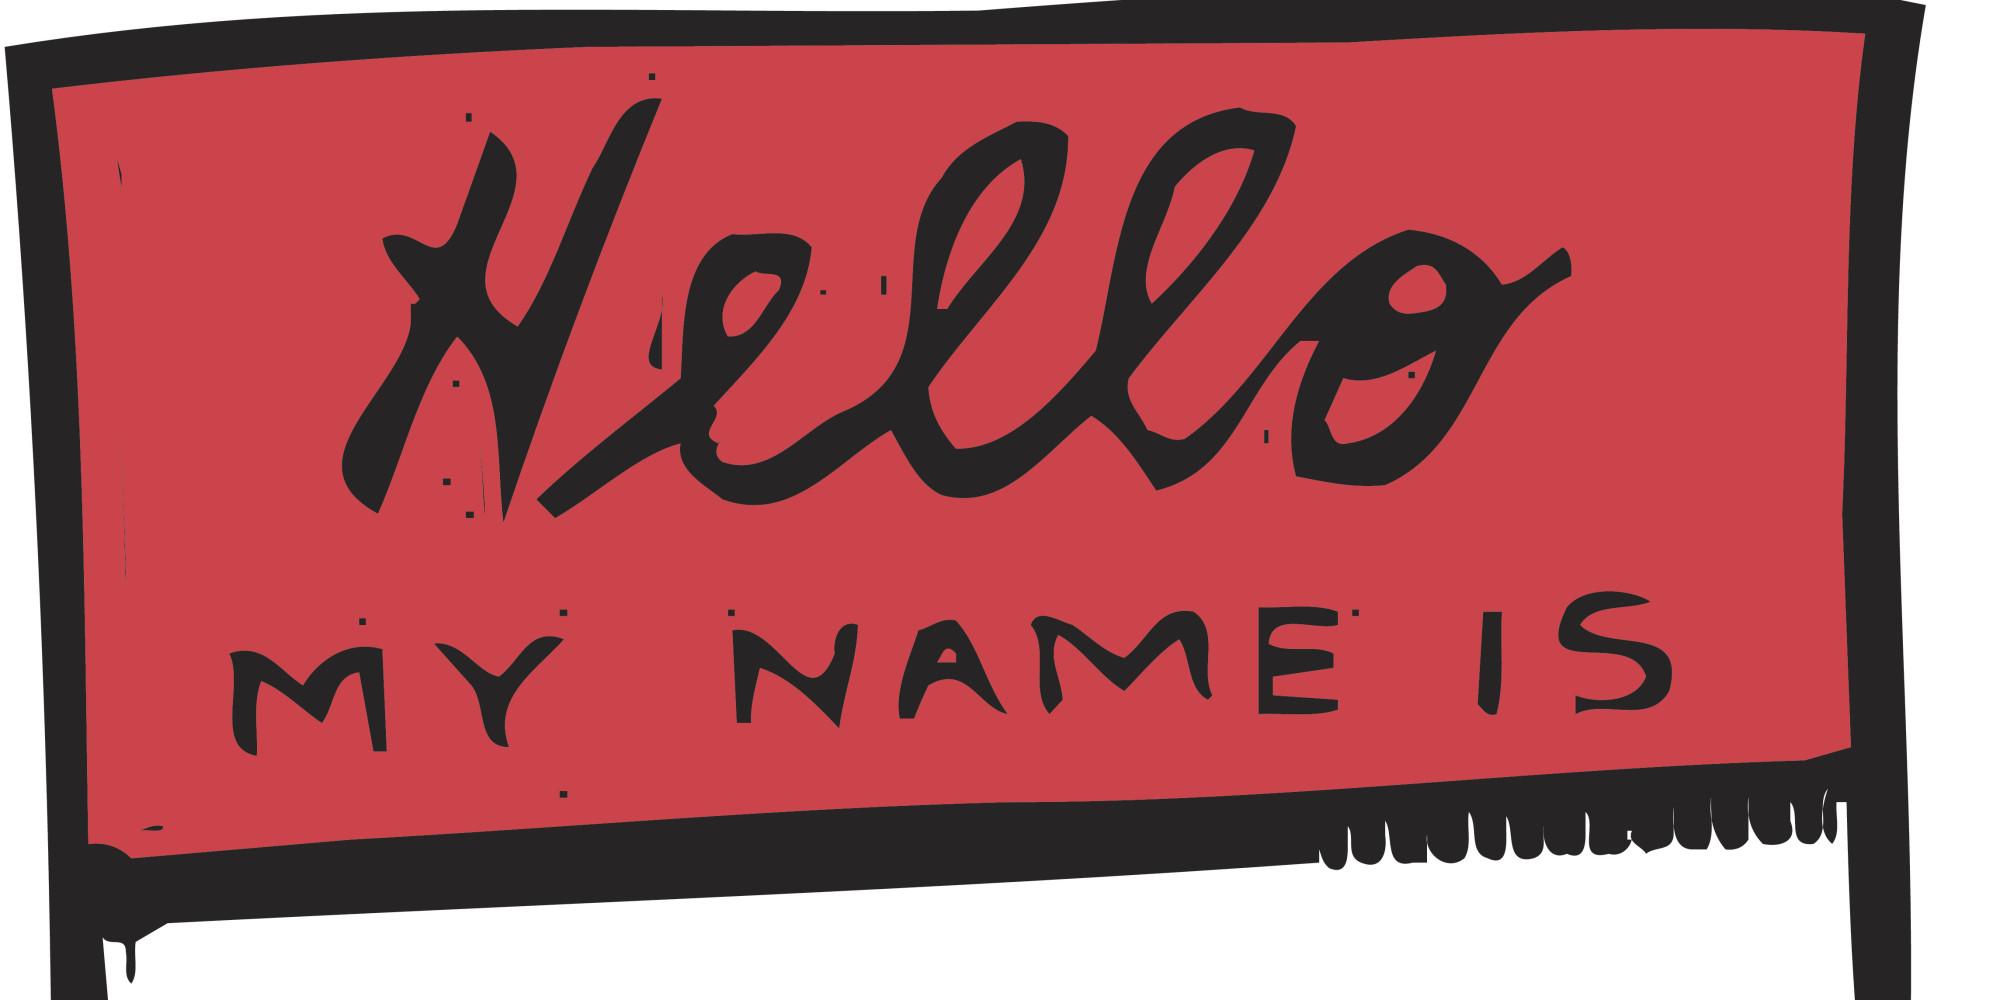 name tag design ideas cartoon blank name tag design should you change